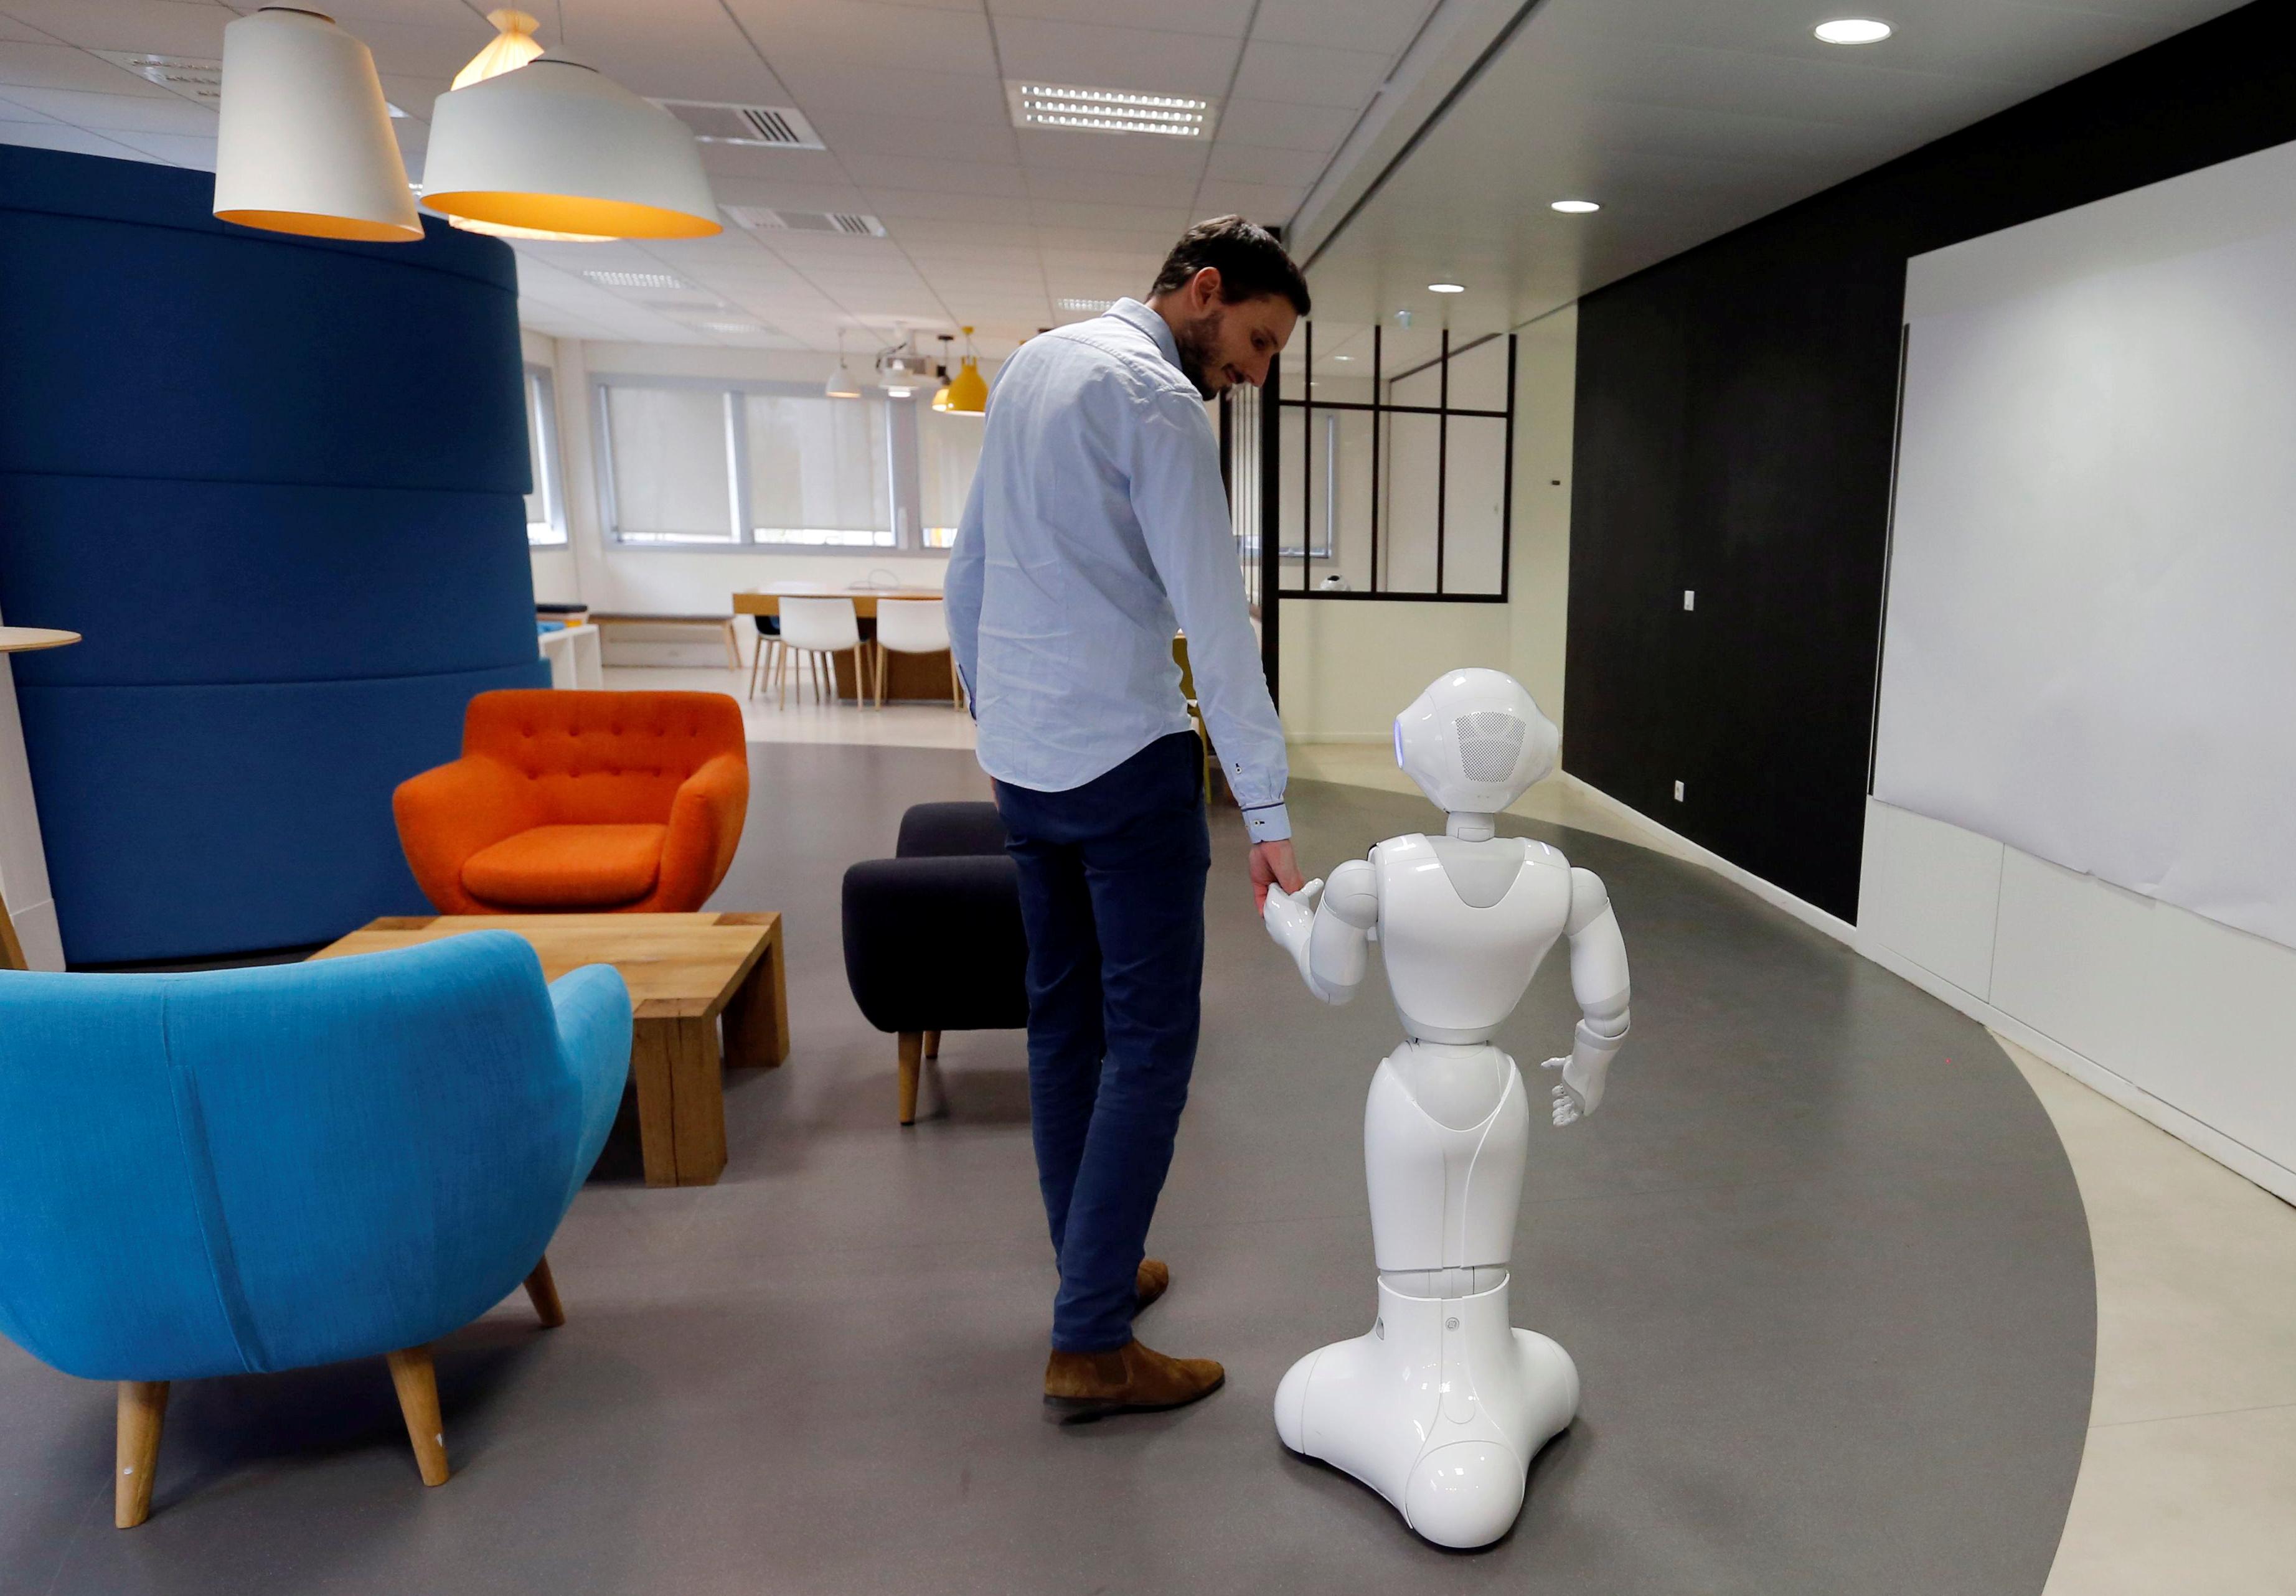 An employee of SoftBank Robotics walks with the Robot Assistant Pepper in Paris, France, March 9, 2018. Picture taken March 9, 2018. REUTERS/Regis Duvignau - RC1D026FA390